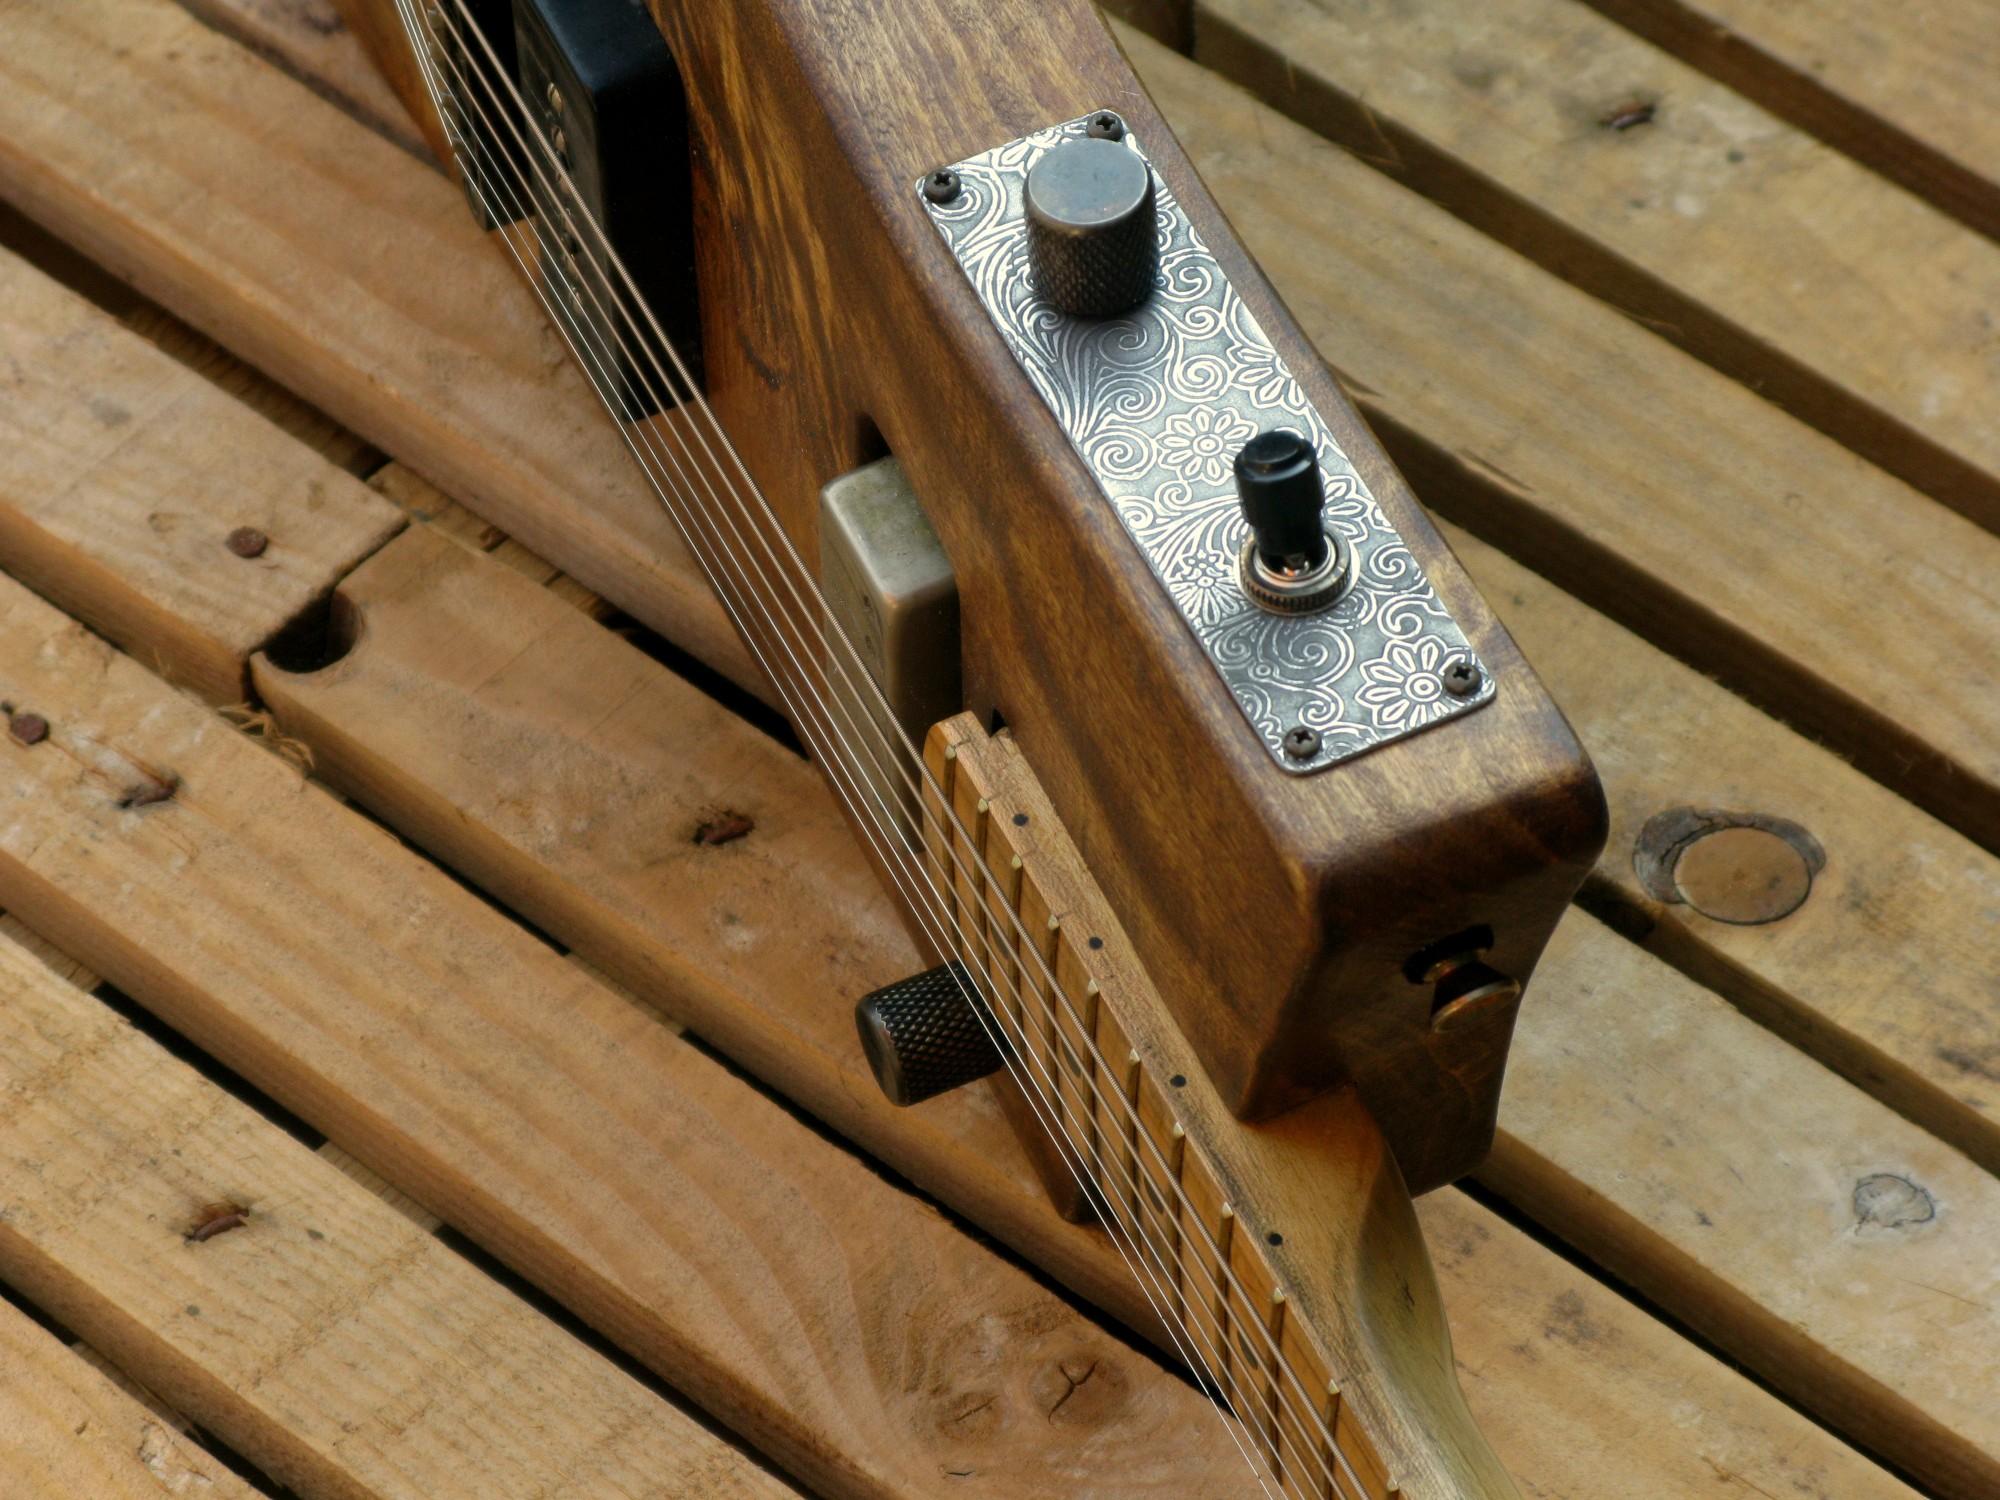 Controlli di una chitarra elettrica in pioppo